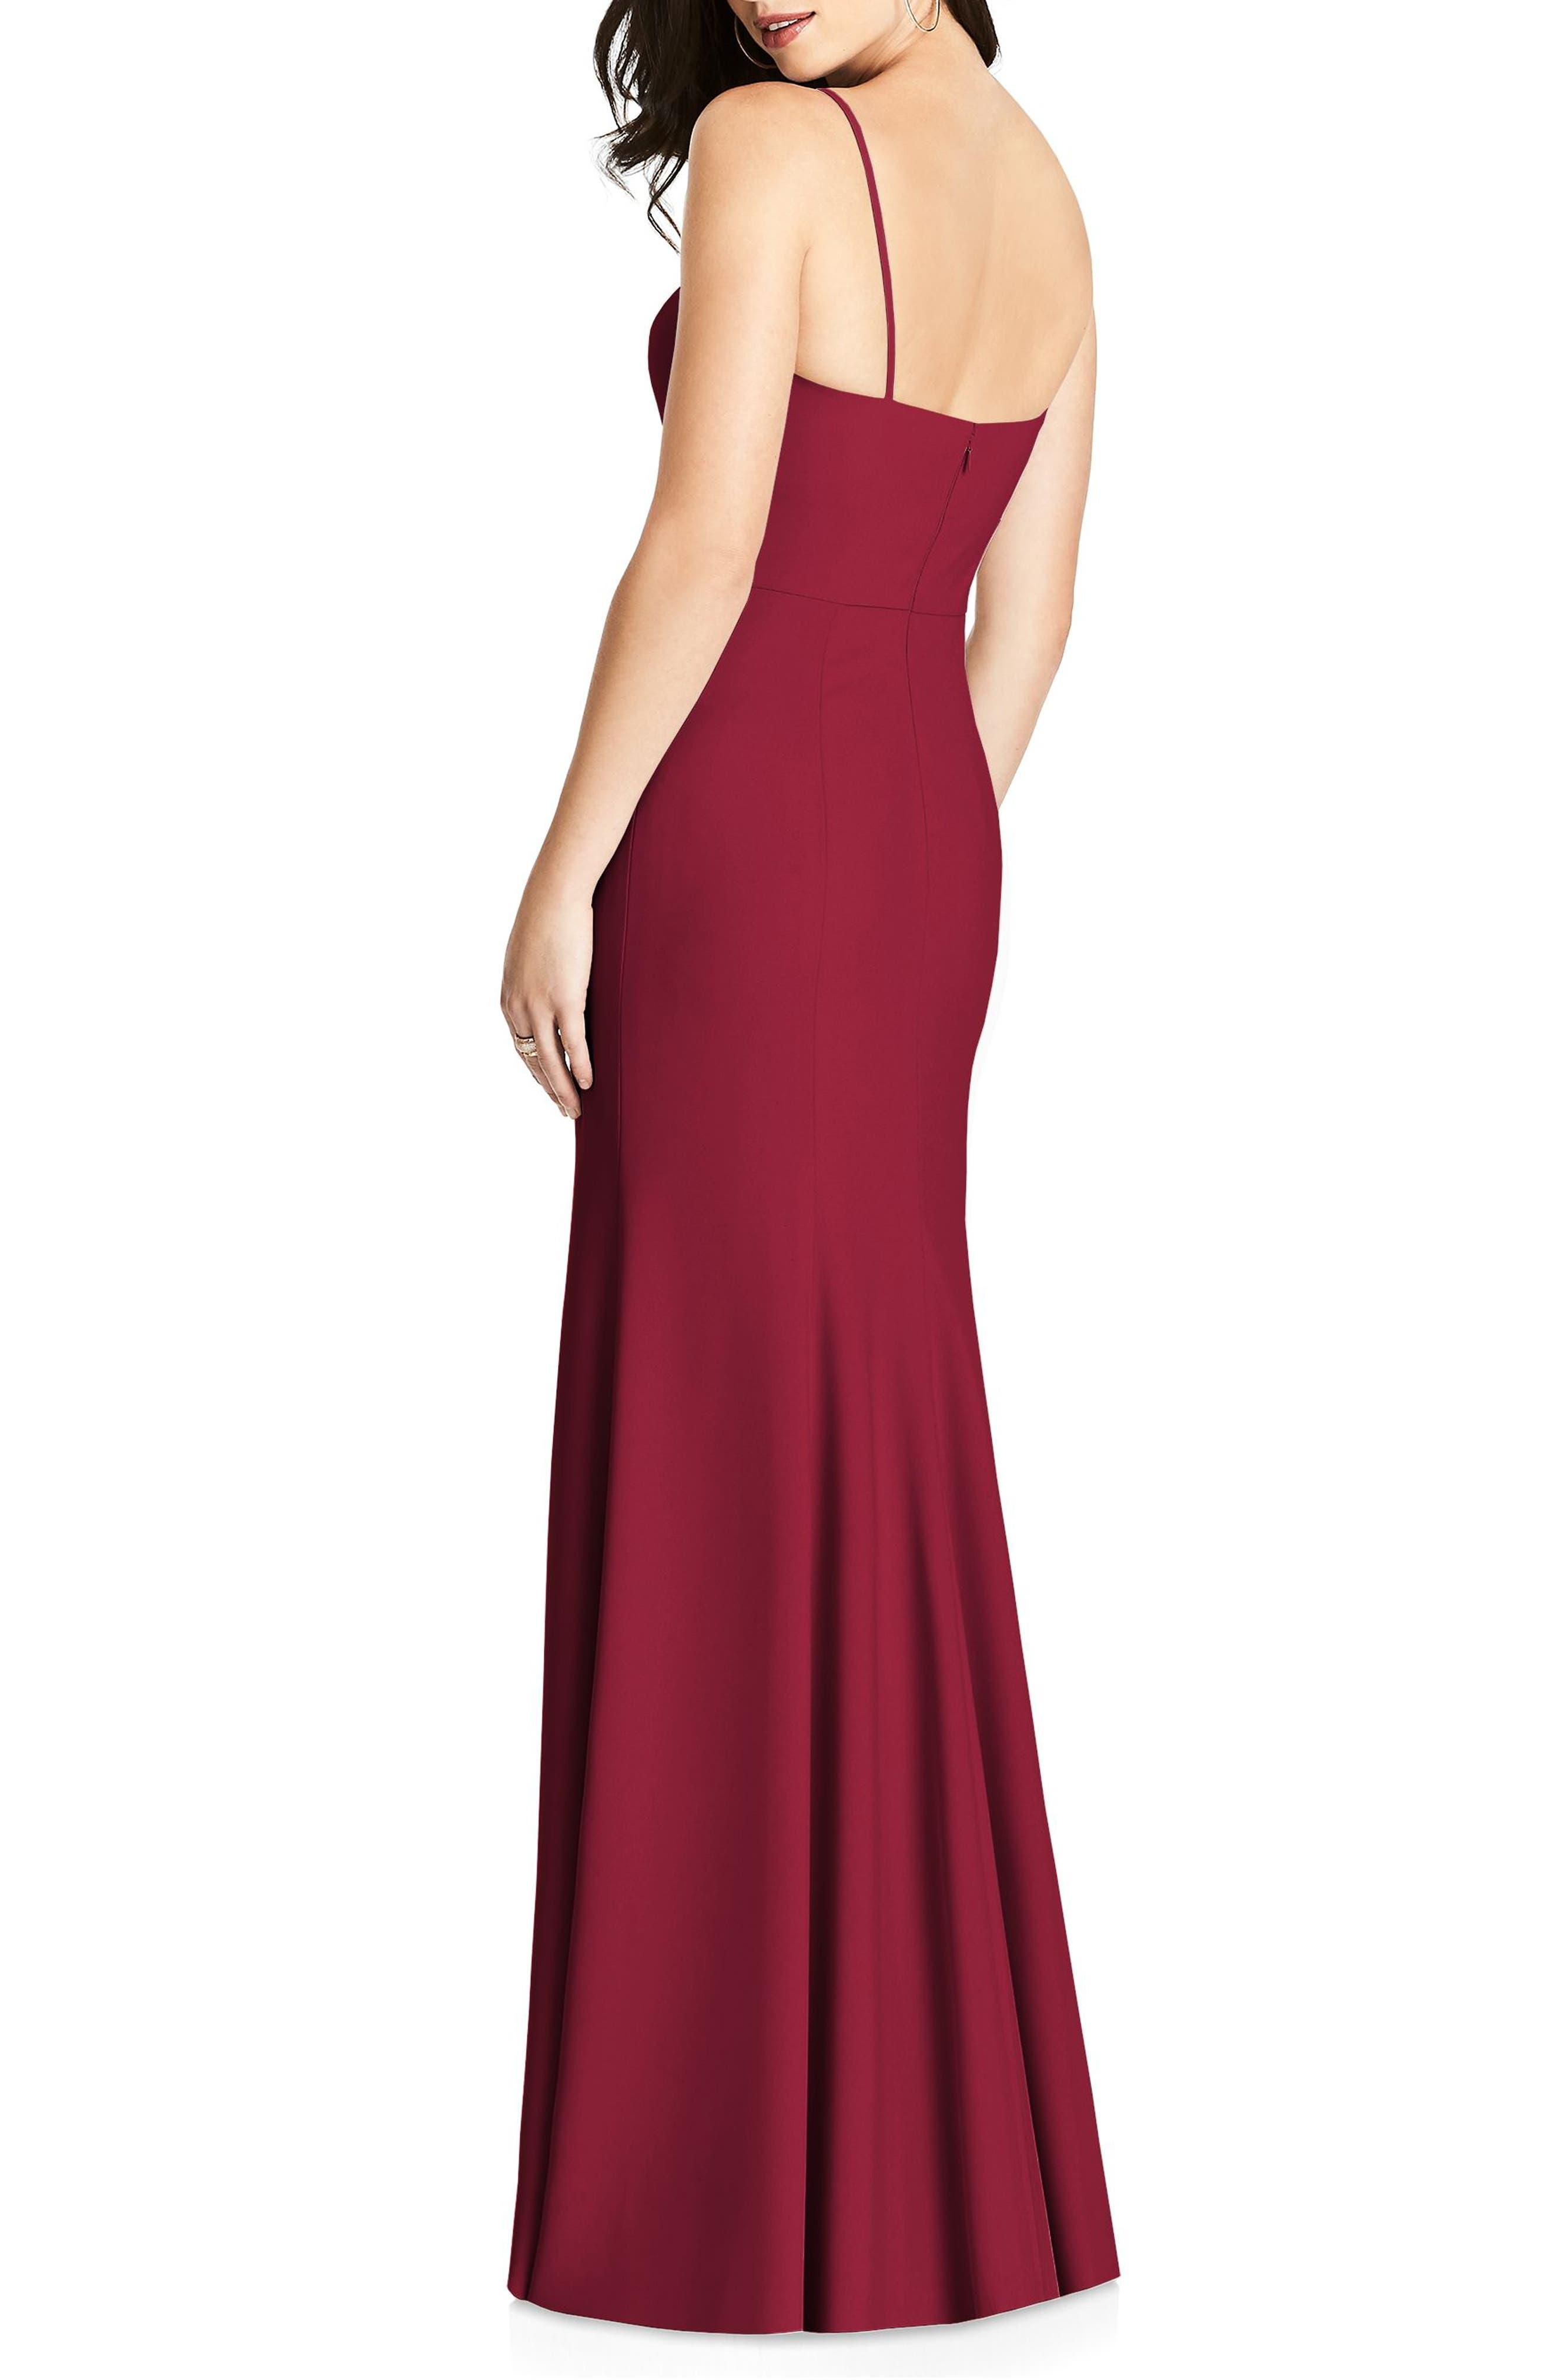 Crisscross Seam Crepe Gown,                             Alternate thumbnail 2, color,                             Burgundy